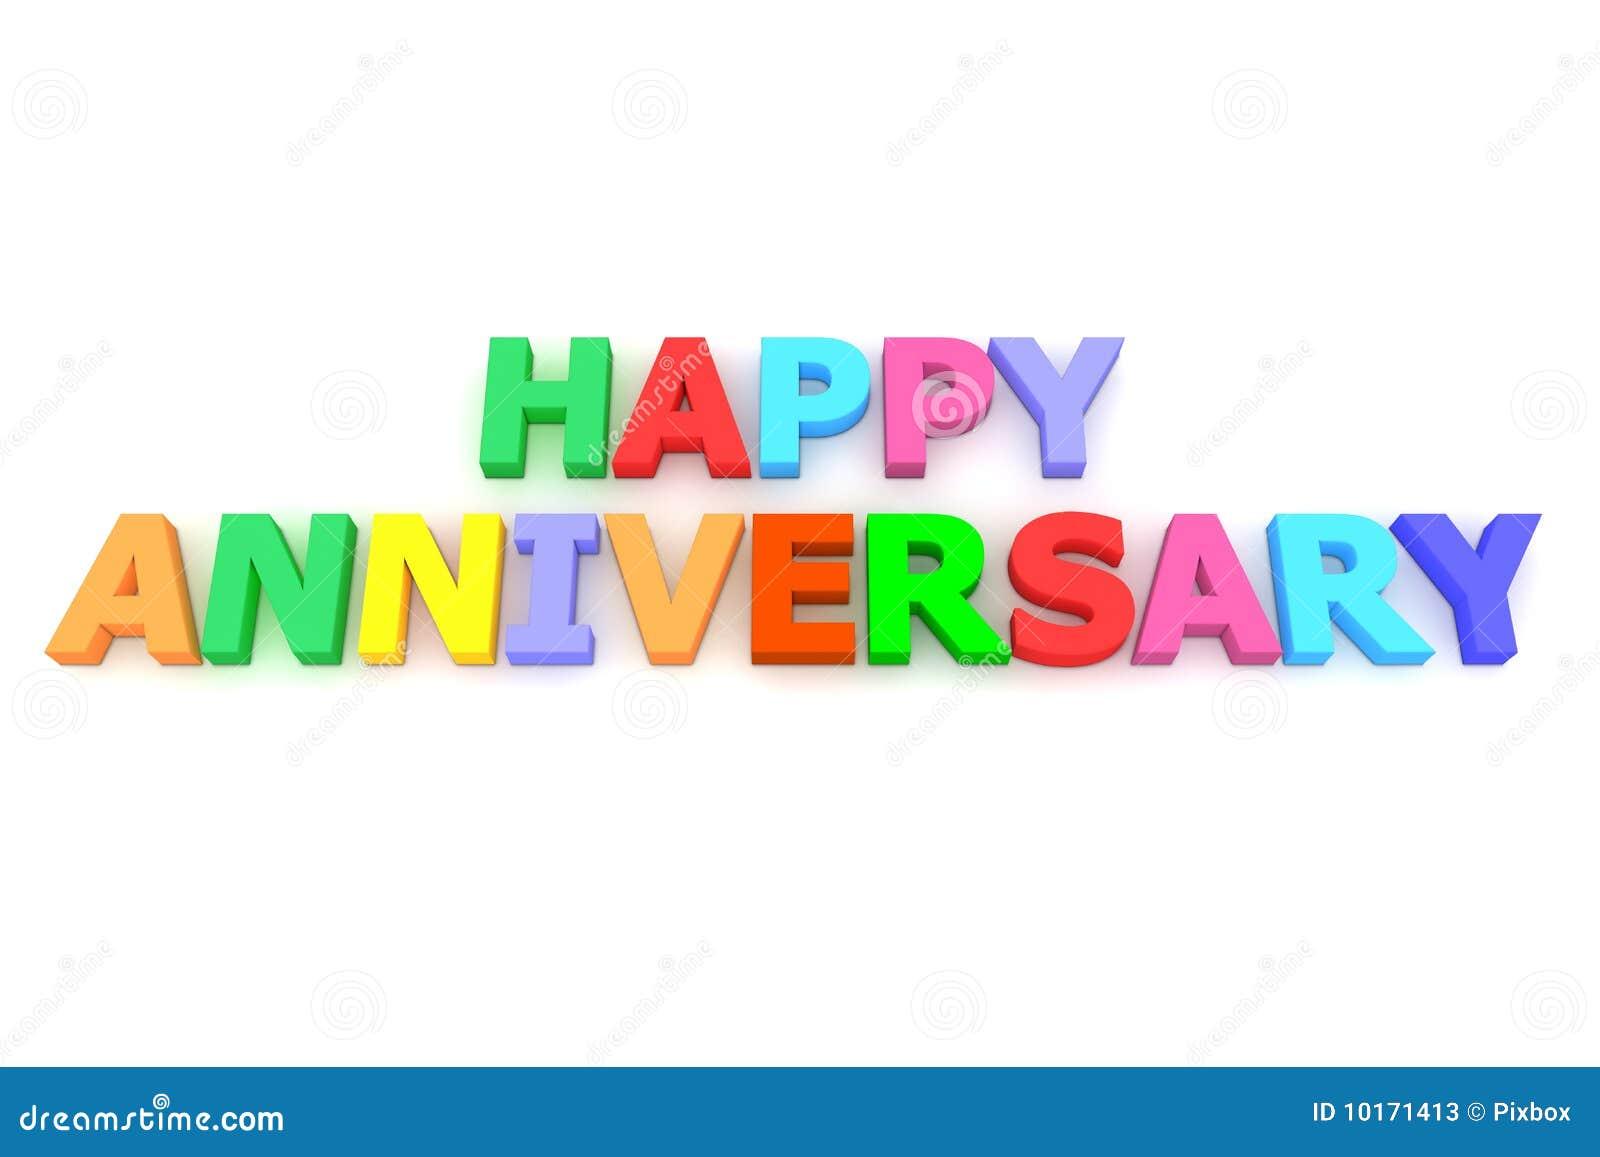 clip art work anniversary